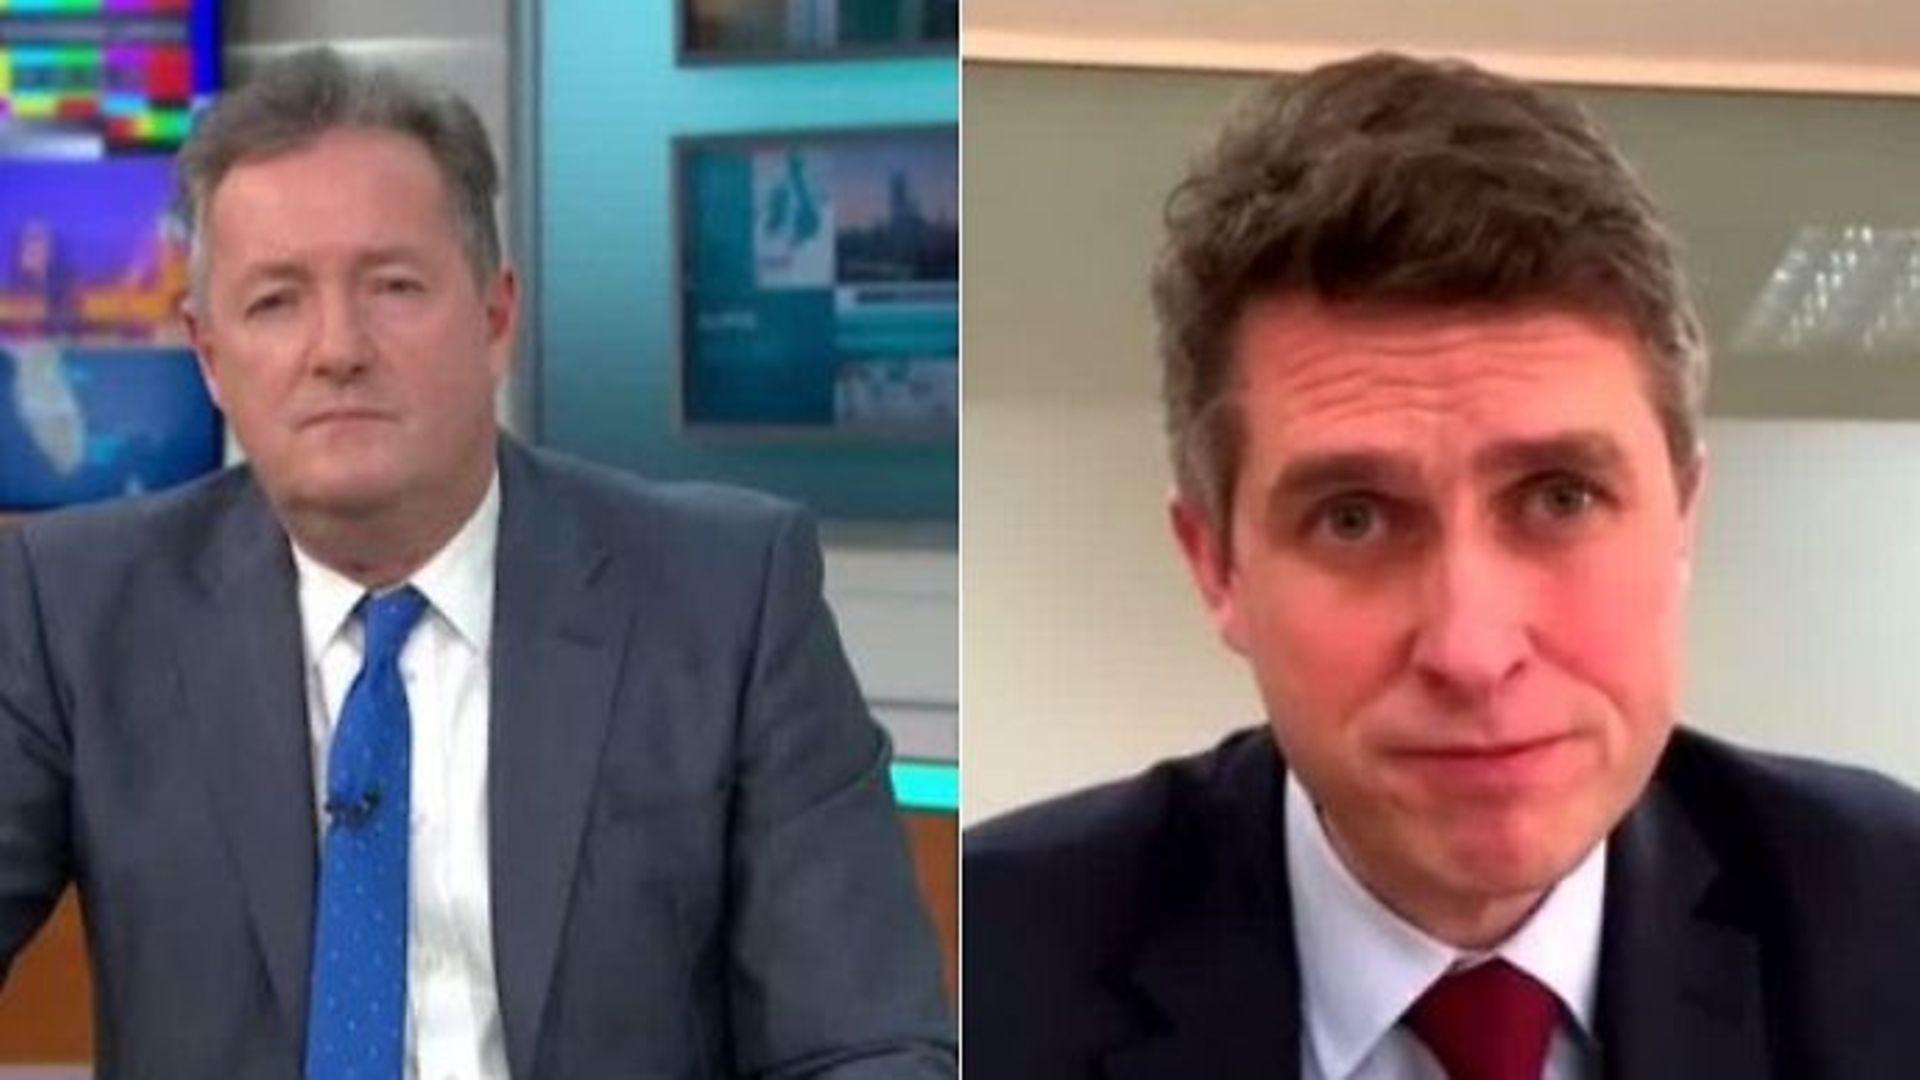 Piers Morgan interviews Gavin Williamson - Credit: ITV